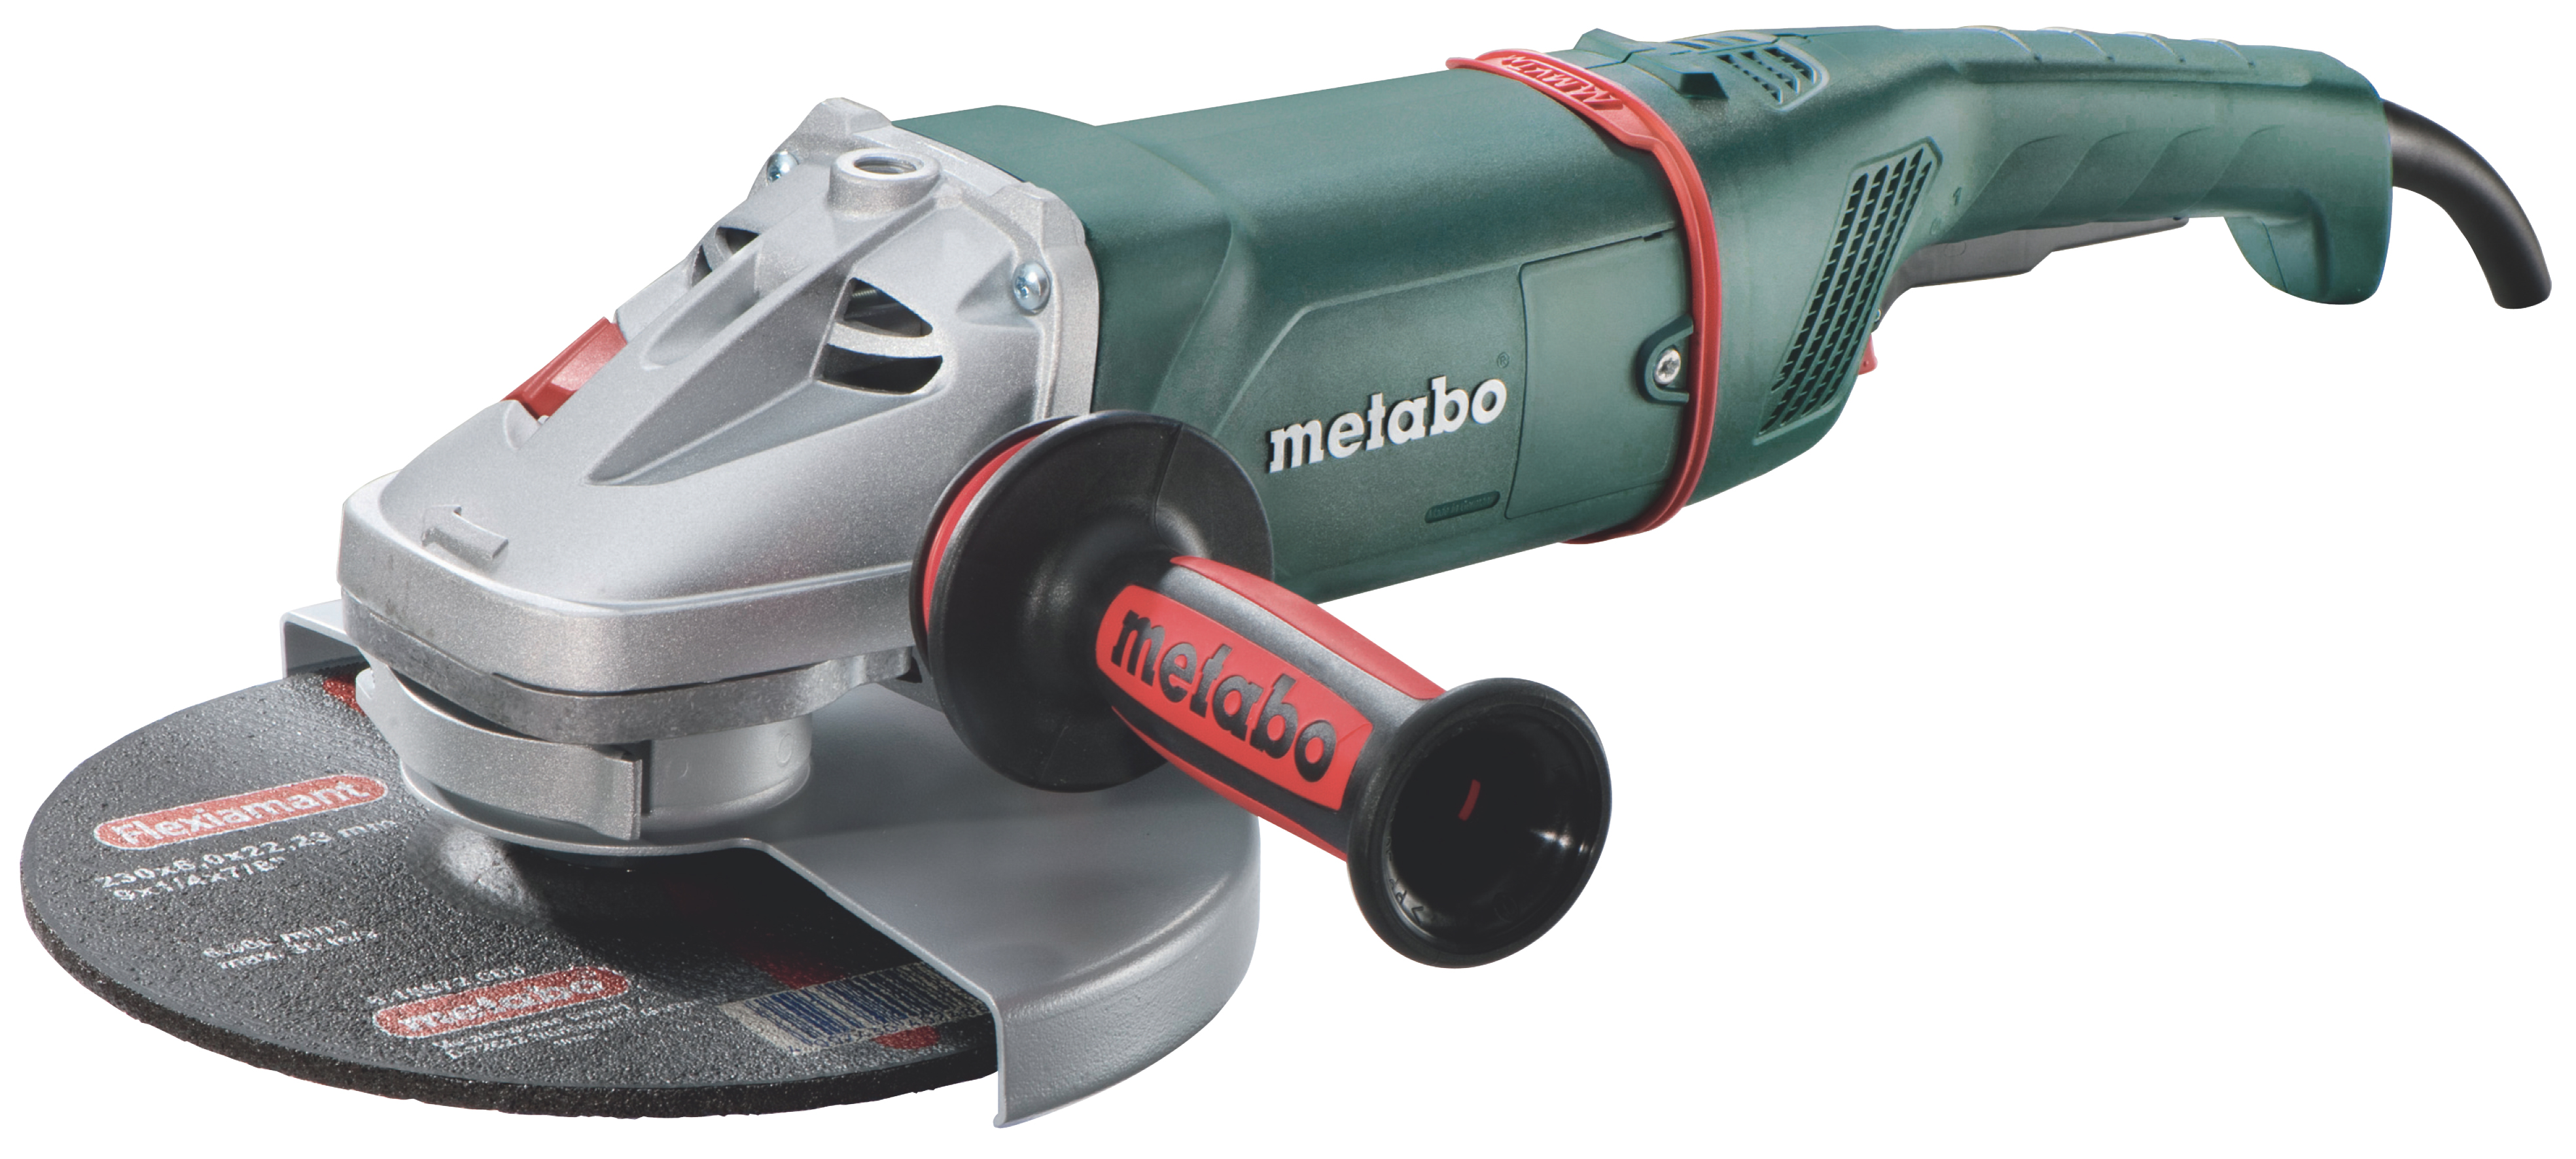 Угловая шлифмашина Metabo W 22-230 MVT  угловая шлифмашина metabo w 26 230 mvt 606474000